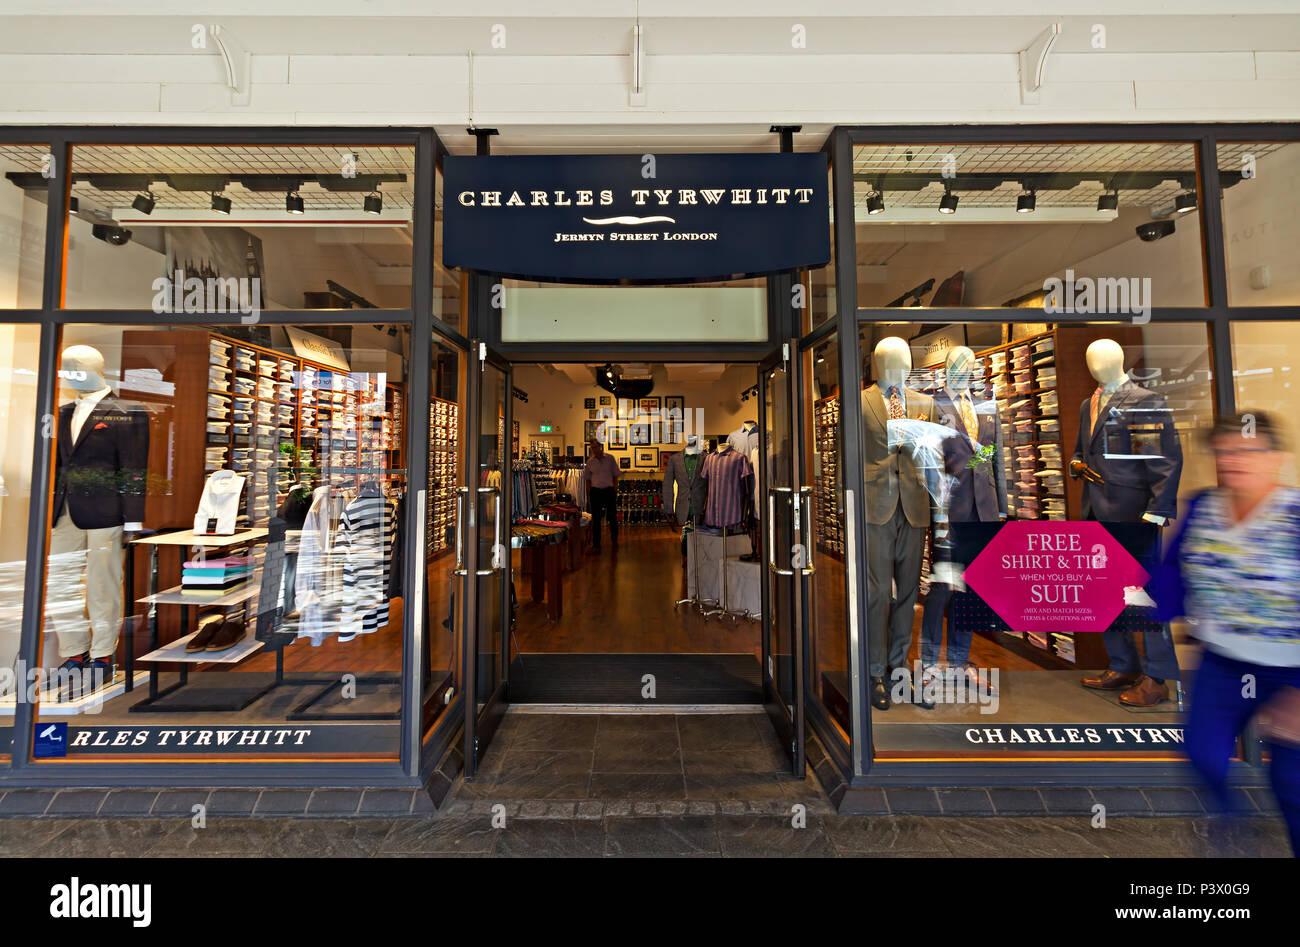 Shop Fassade des Charles Tyrwhitt store Designer Cheshire